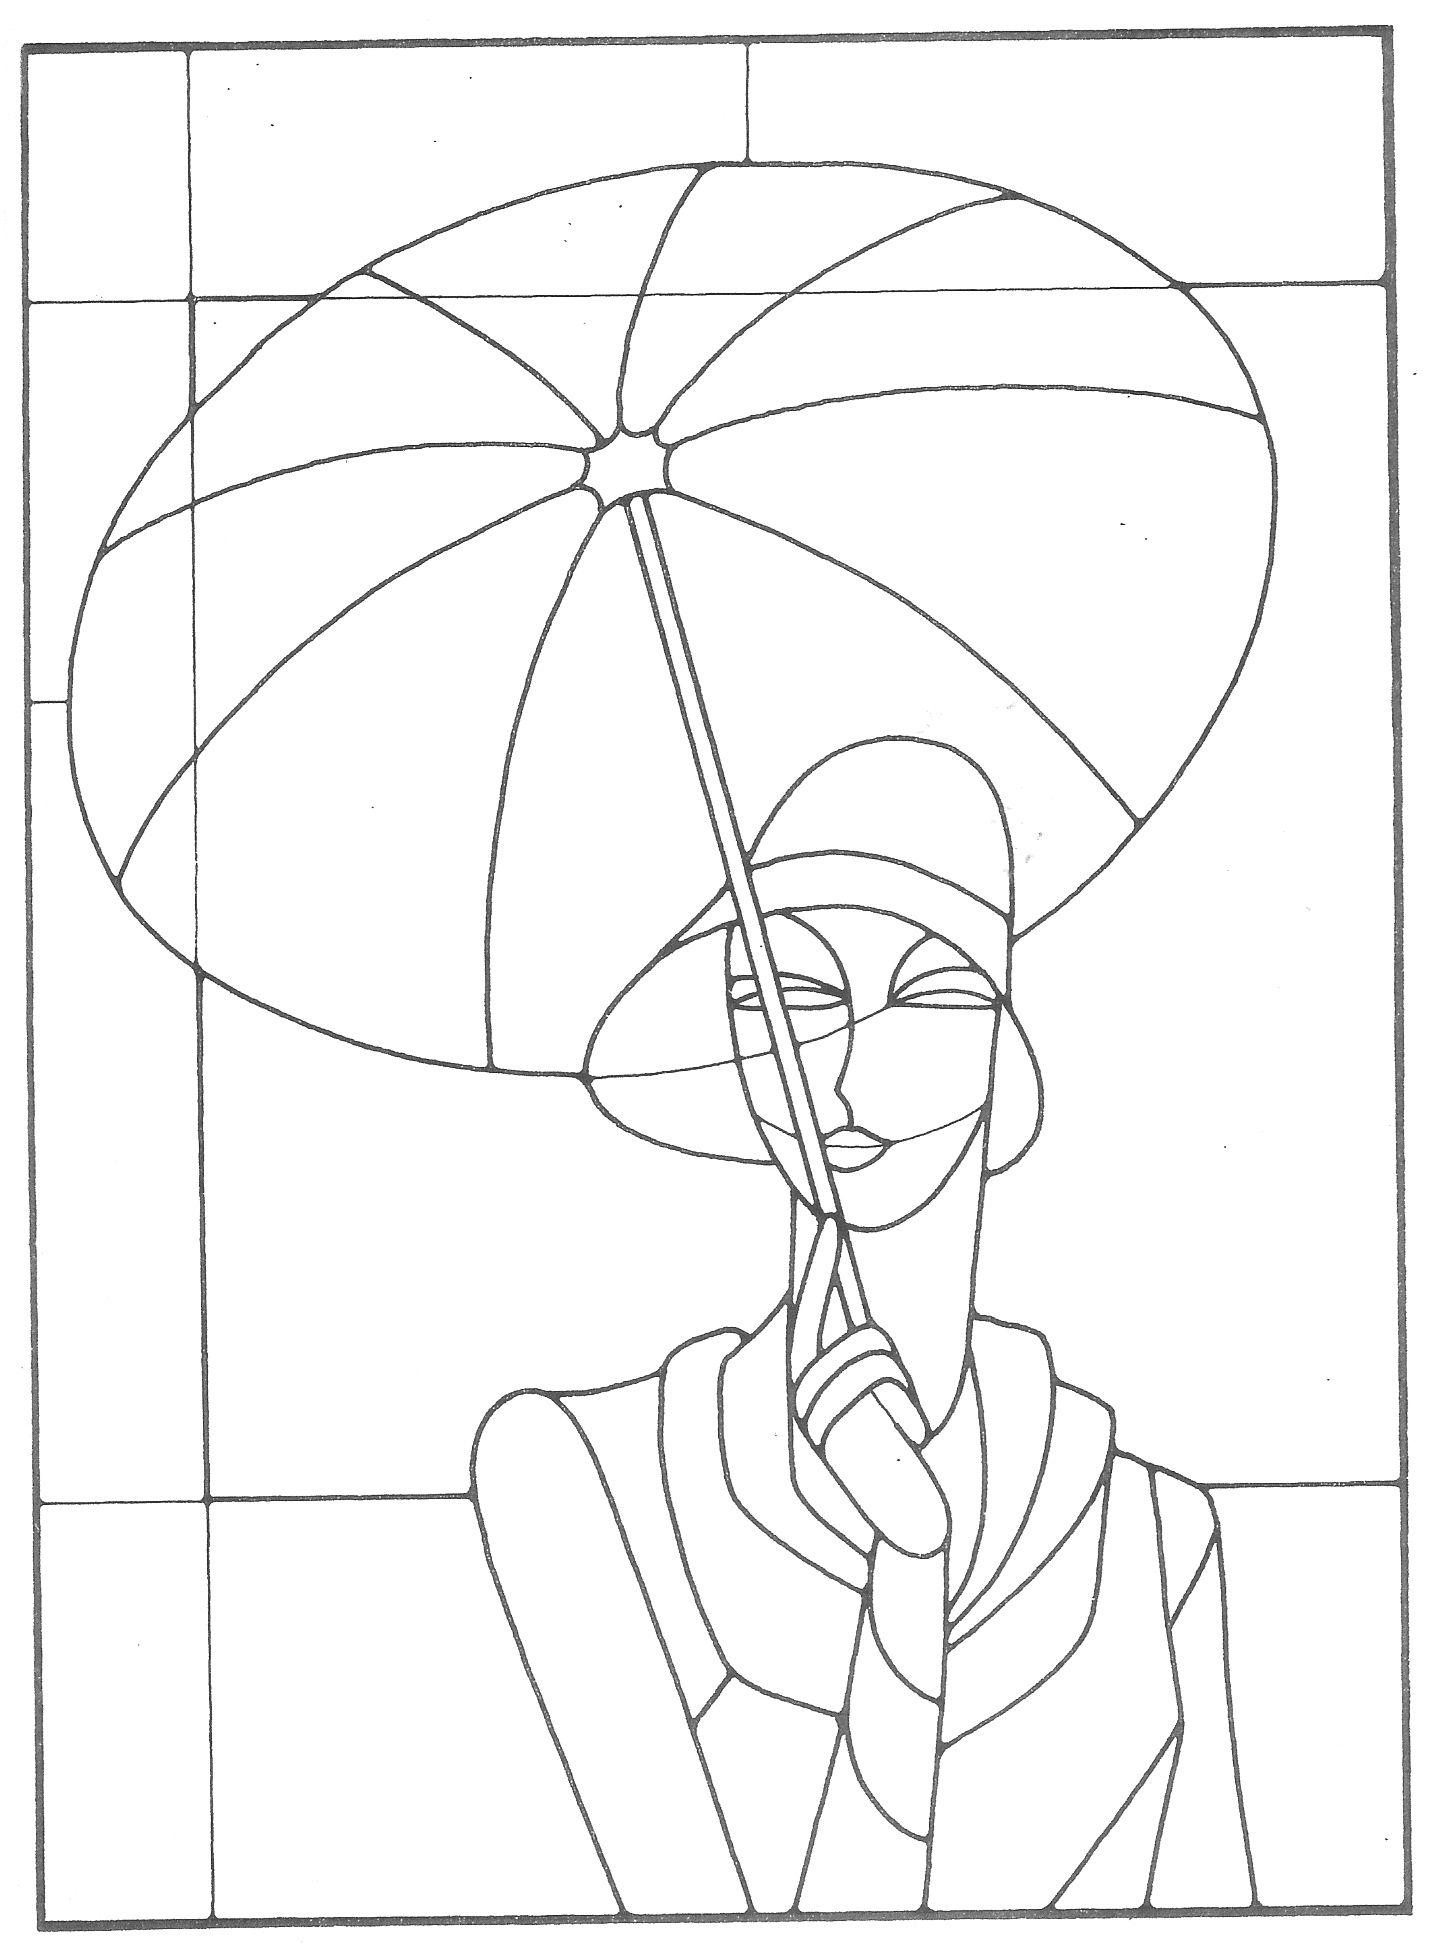 Art deco woman with umbrella pattern